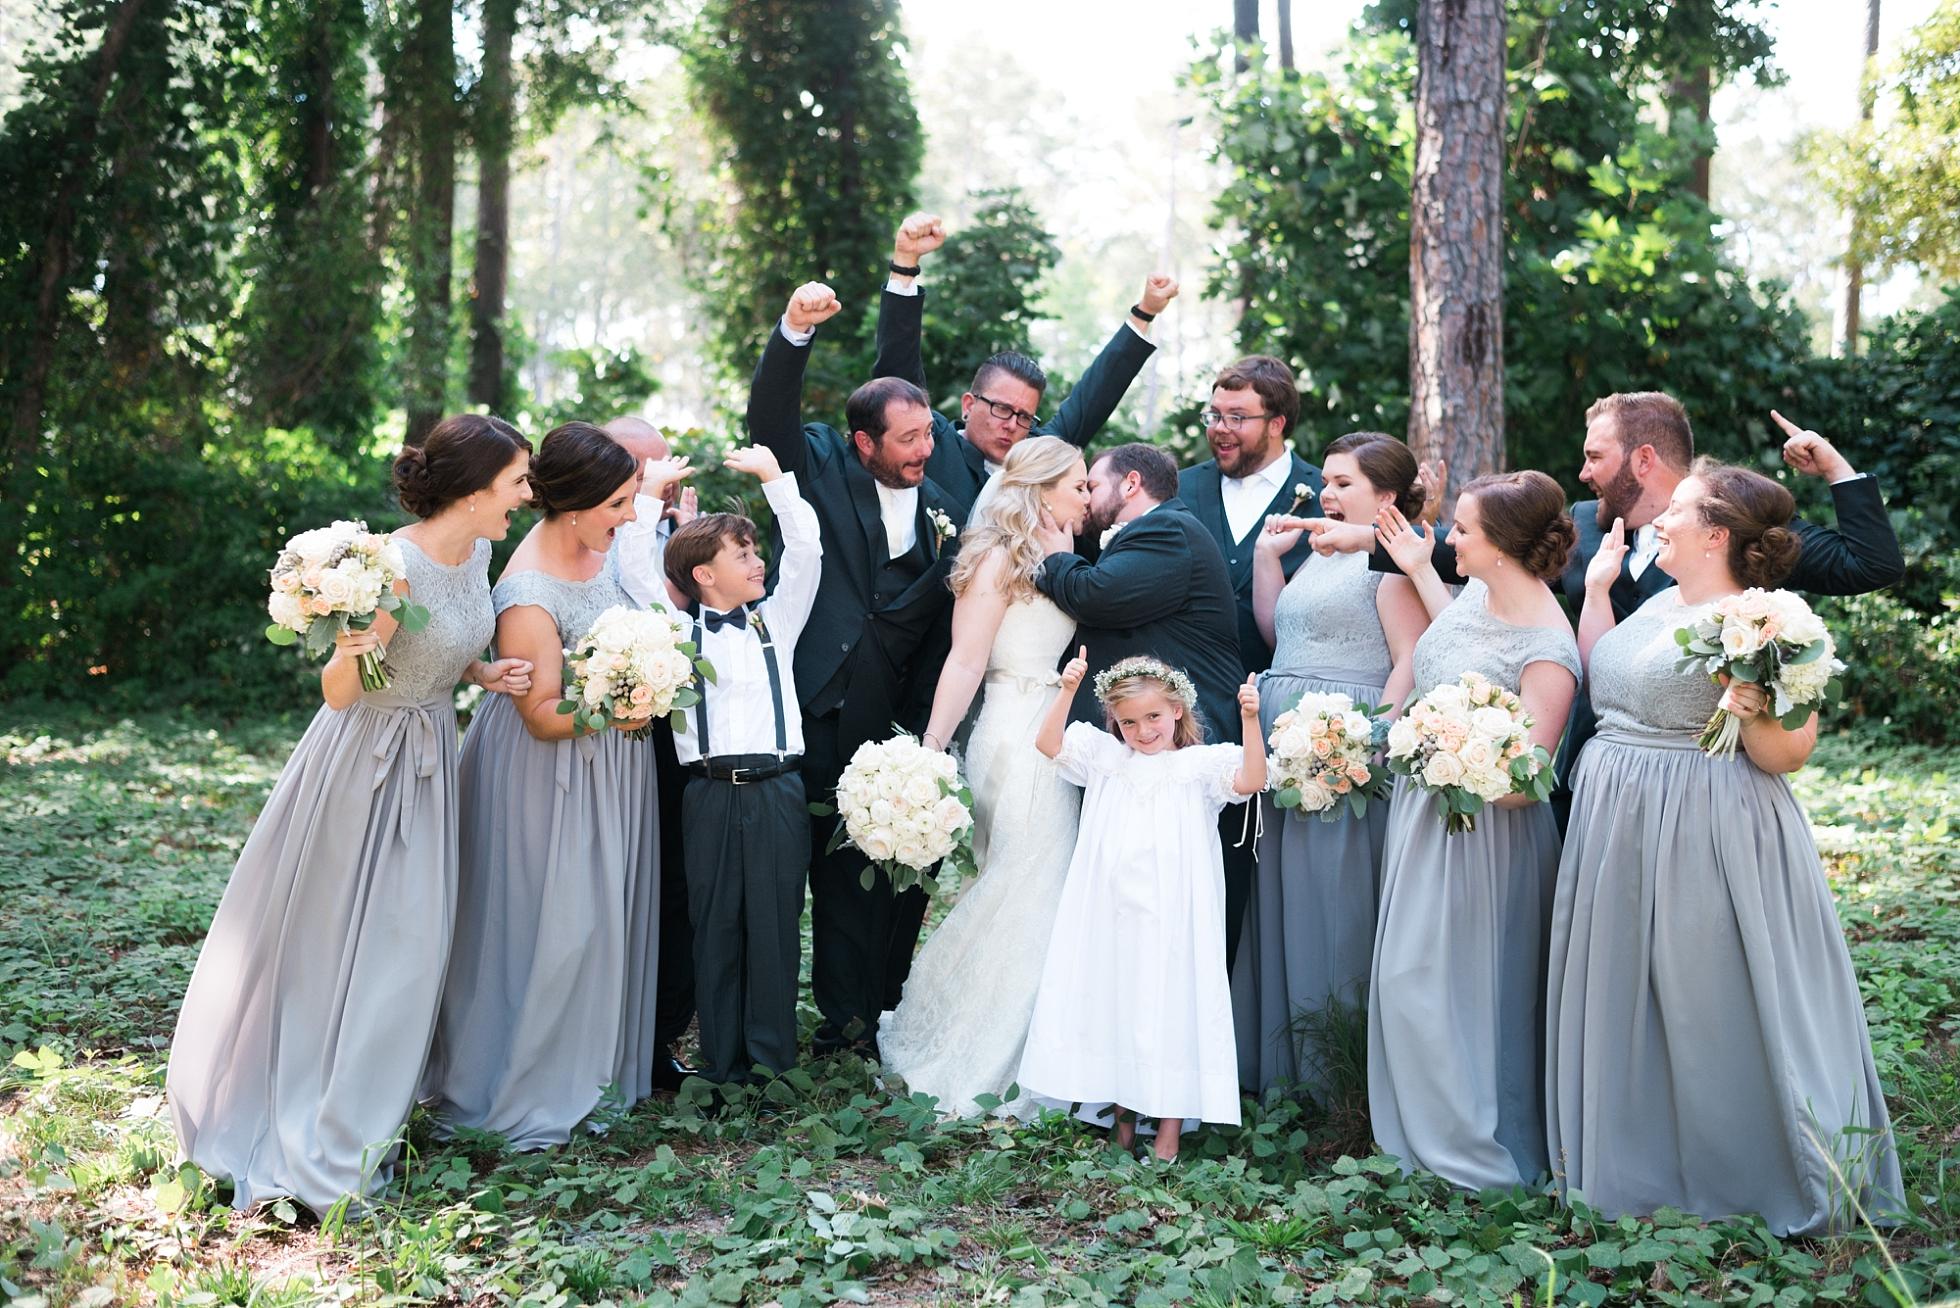 Wedding Party | Kyle & Erin | Scarbrough Wedding | Children's Harbor | Laura Wilkerson Photography